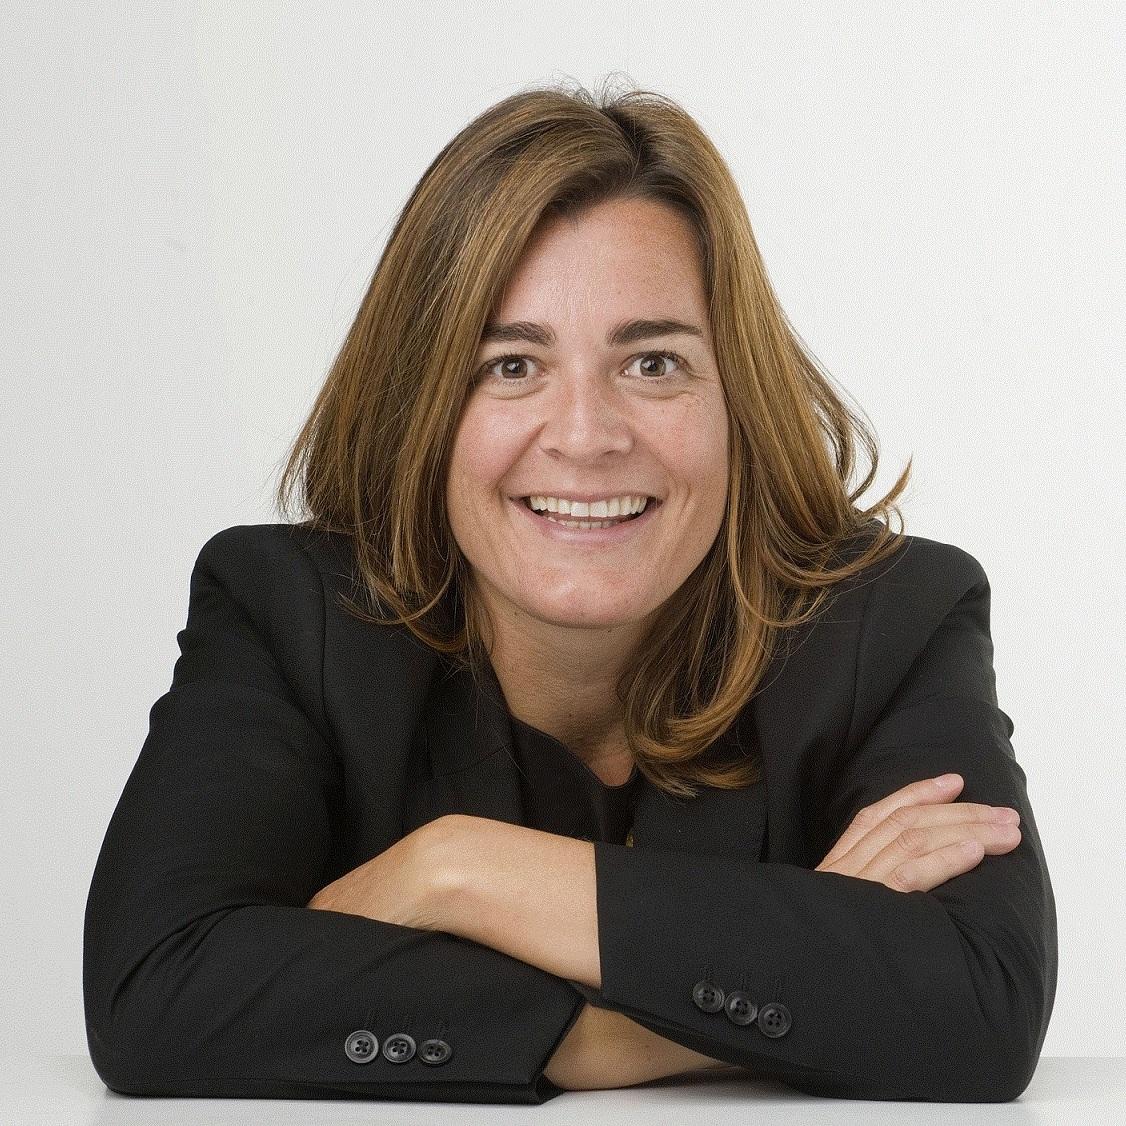 María Zubeldía Díaz